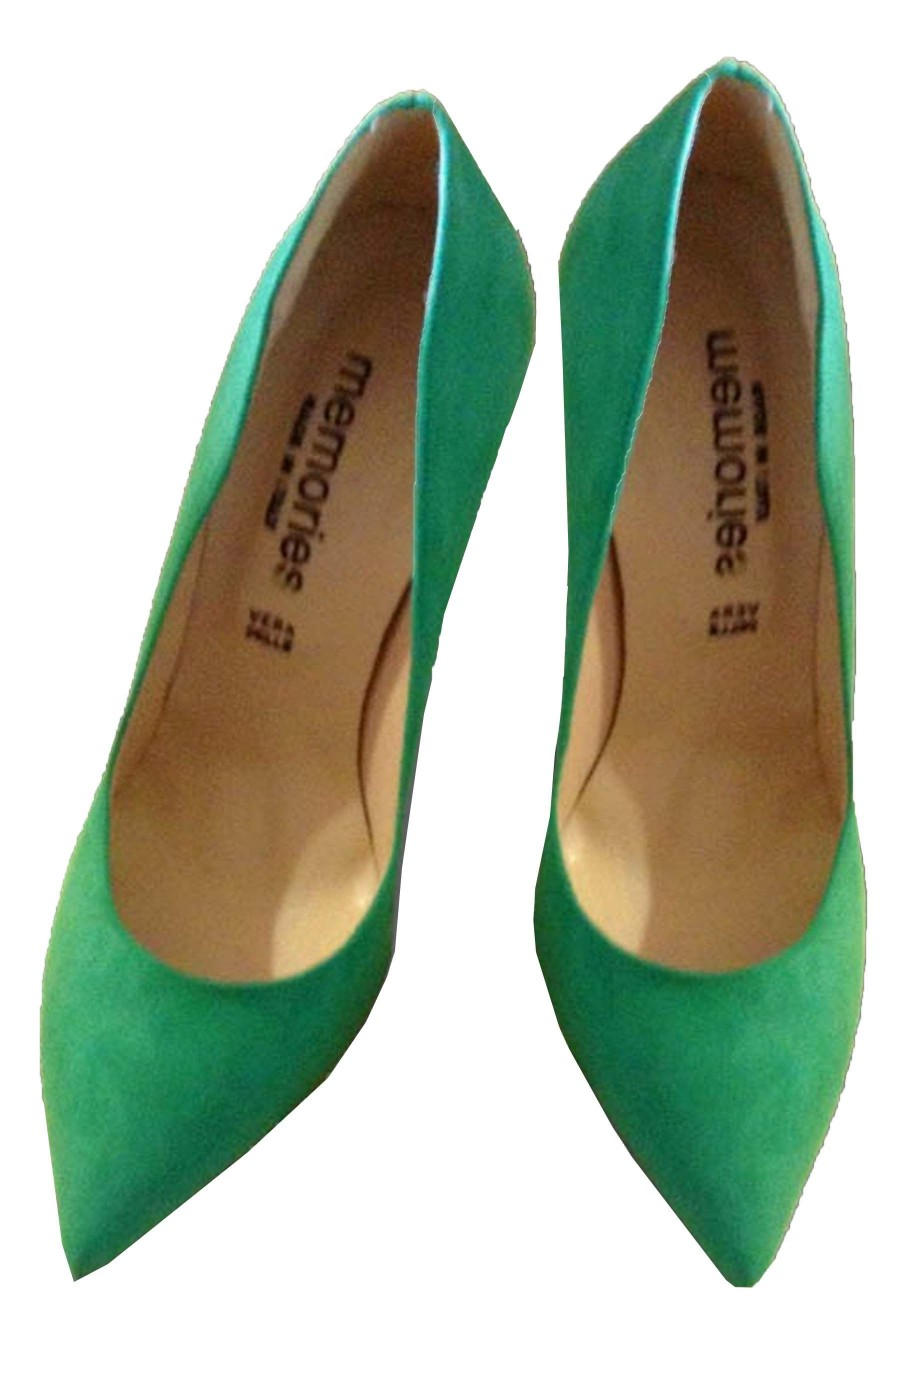 Scarpe verdi per Elfa, Poison Ivy ecc